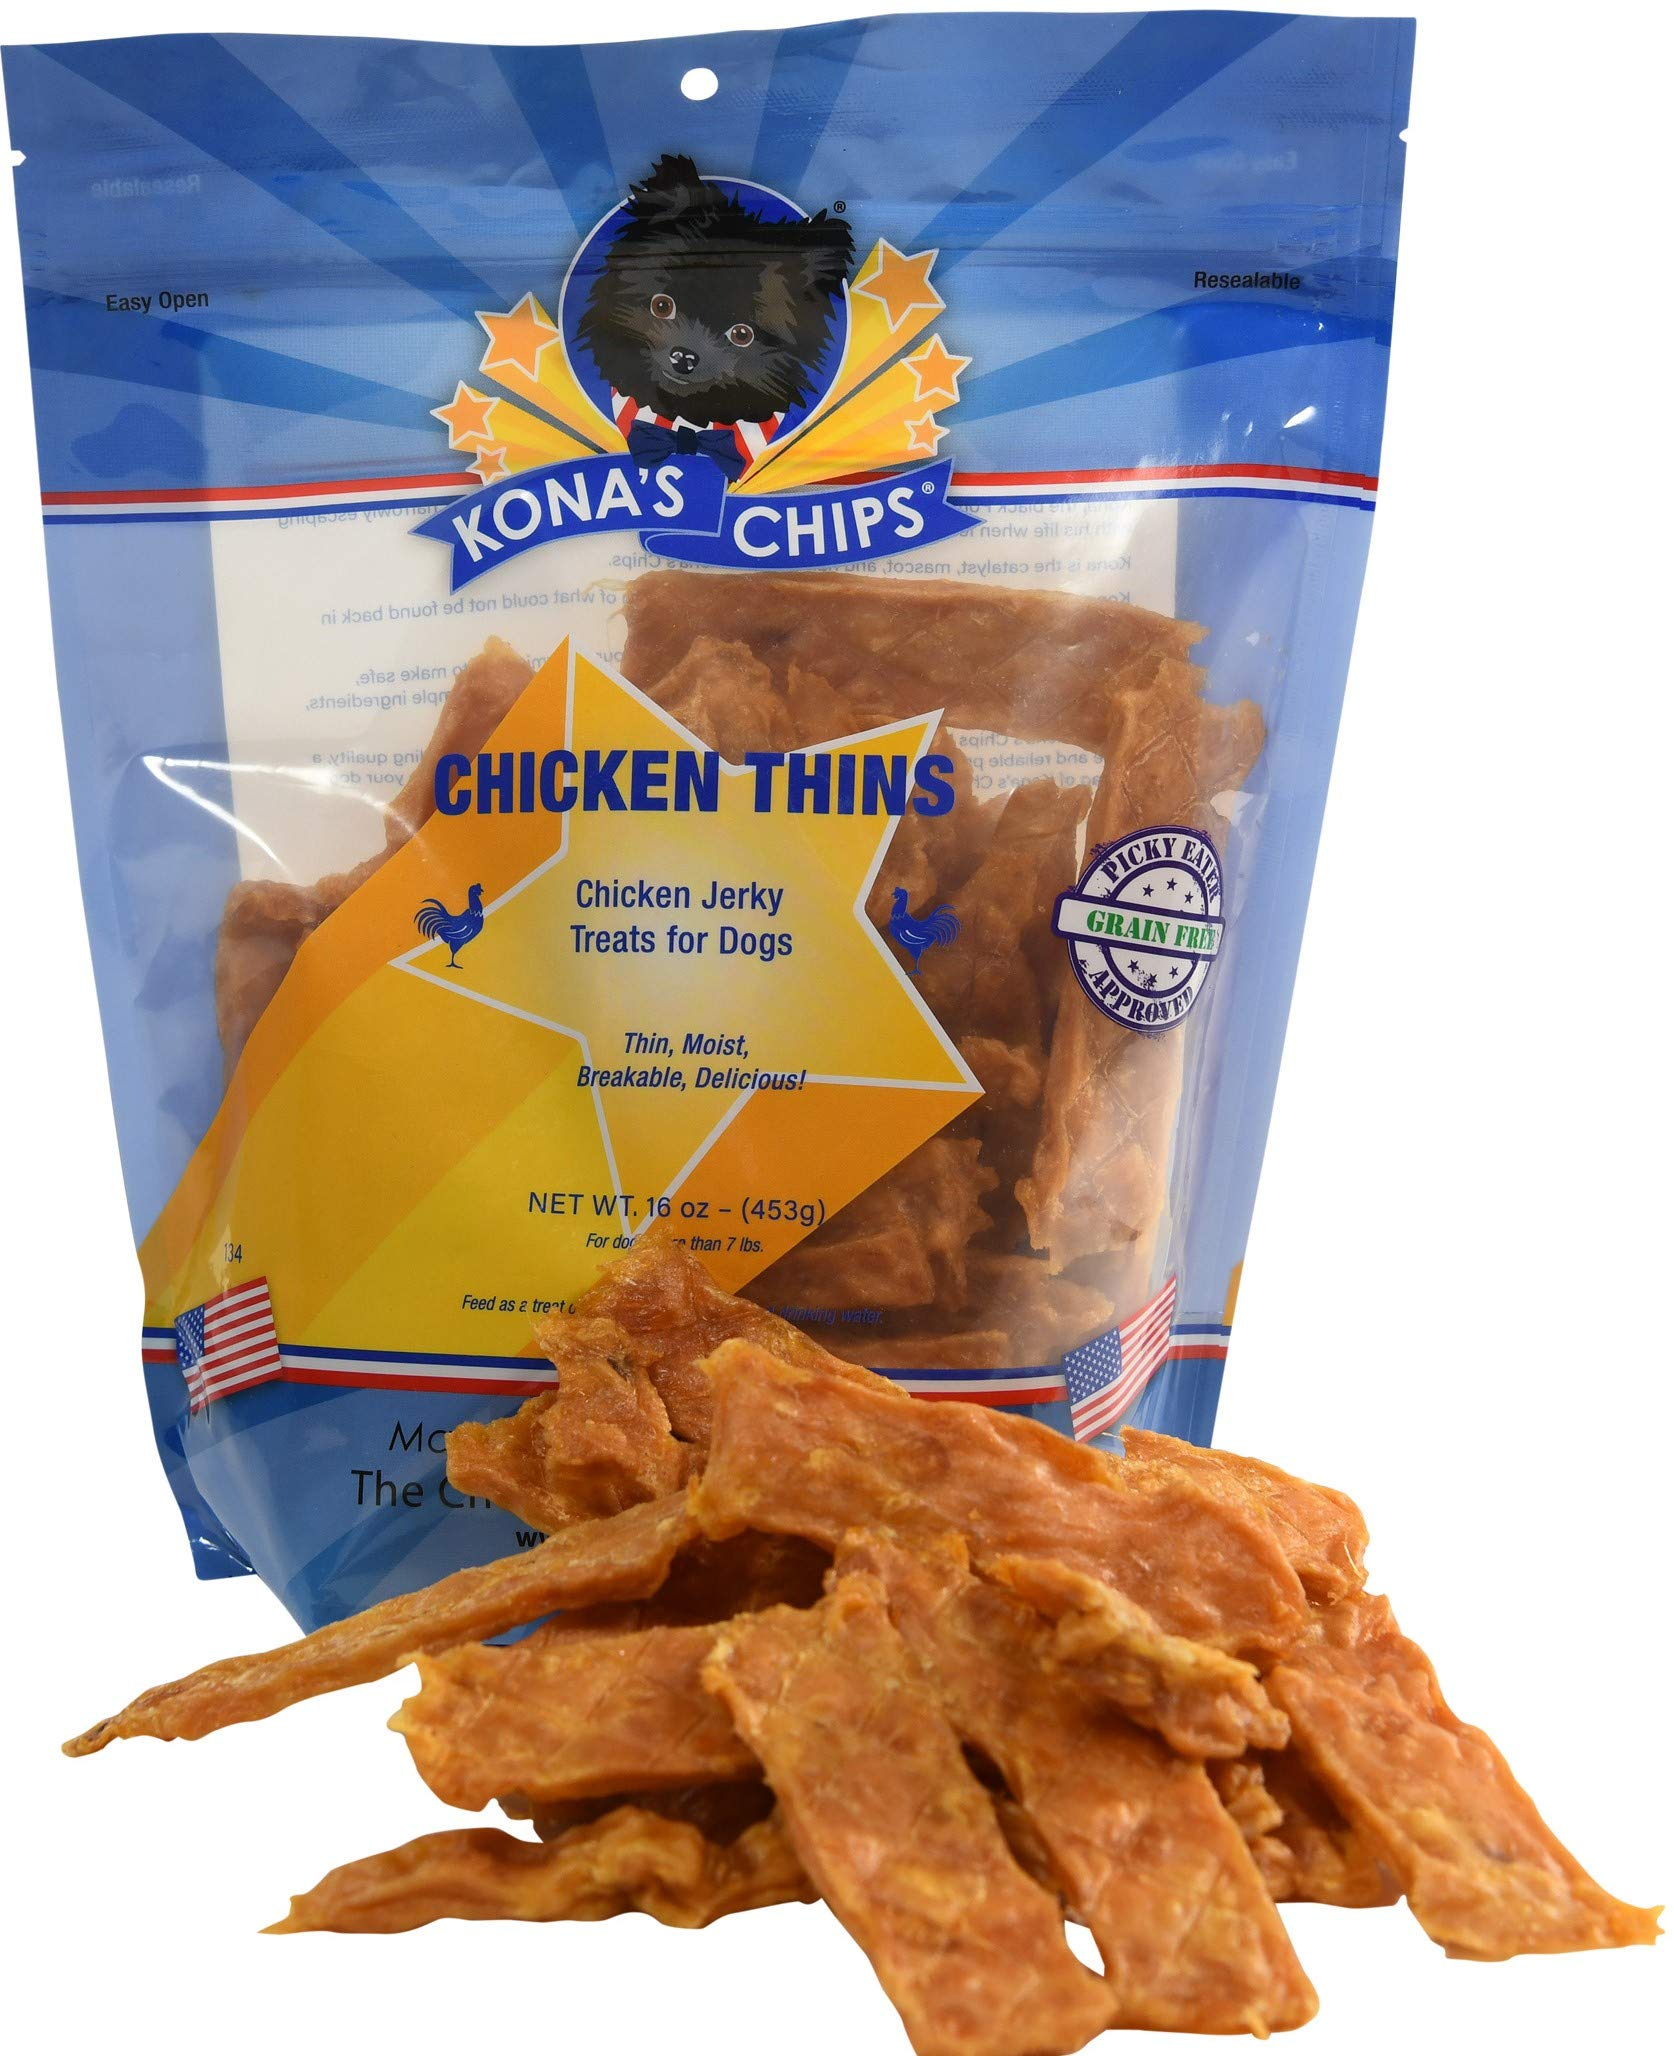 KONA'S CHIPS Chicken Thins; Chicken Jerky Dog Treats